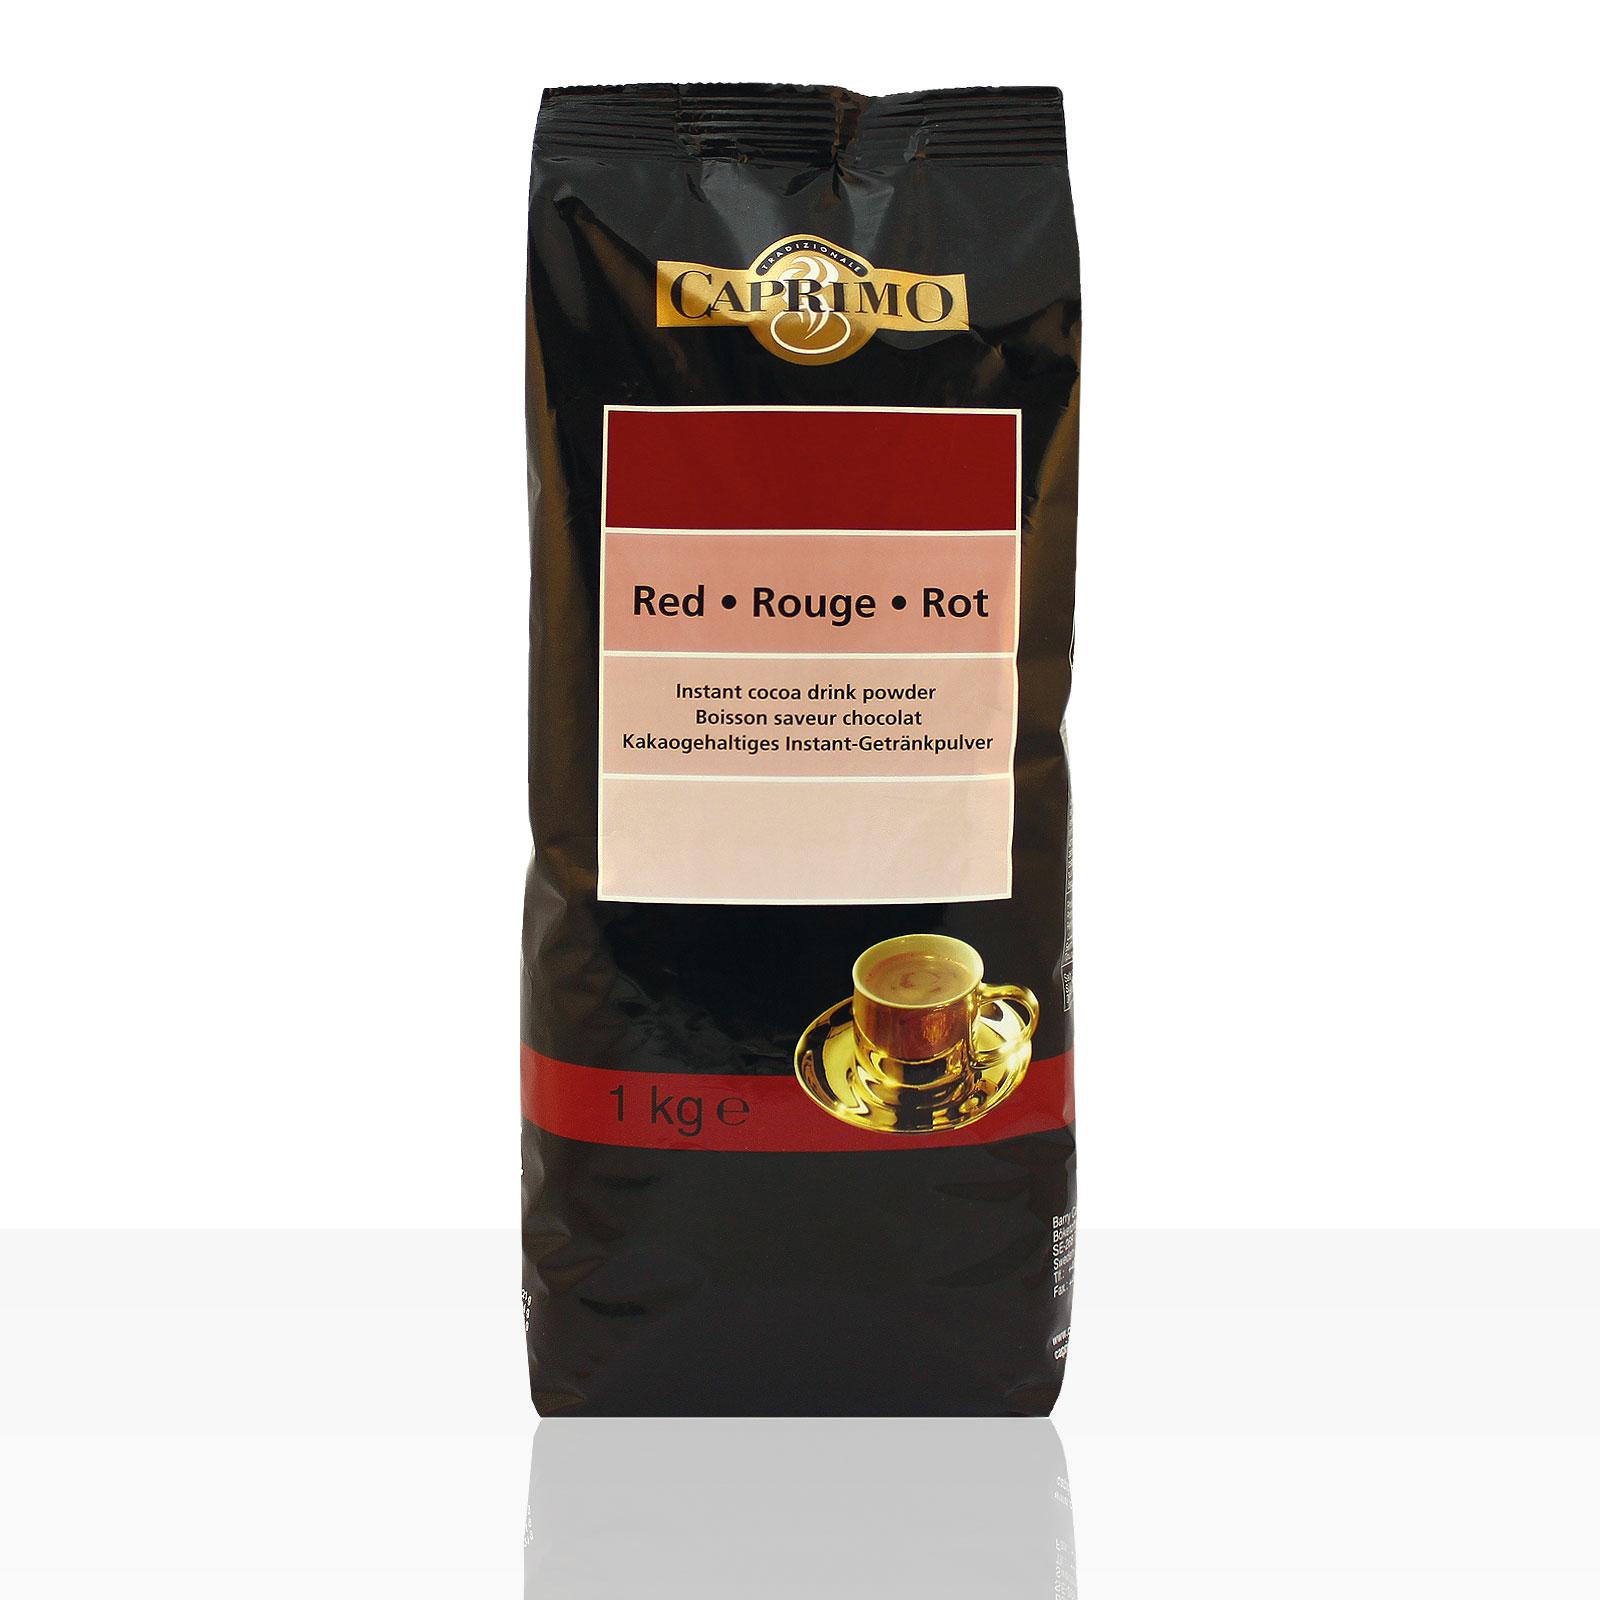 Caprimo Instant Choco Red 1kg Kakao, 16% Kakaoanteil